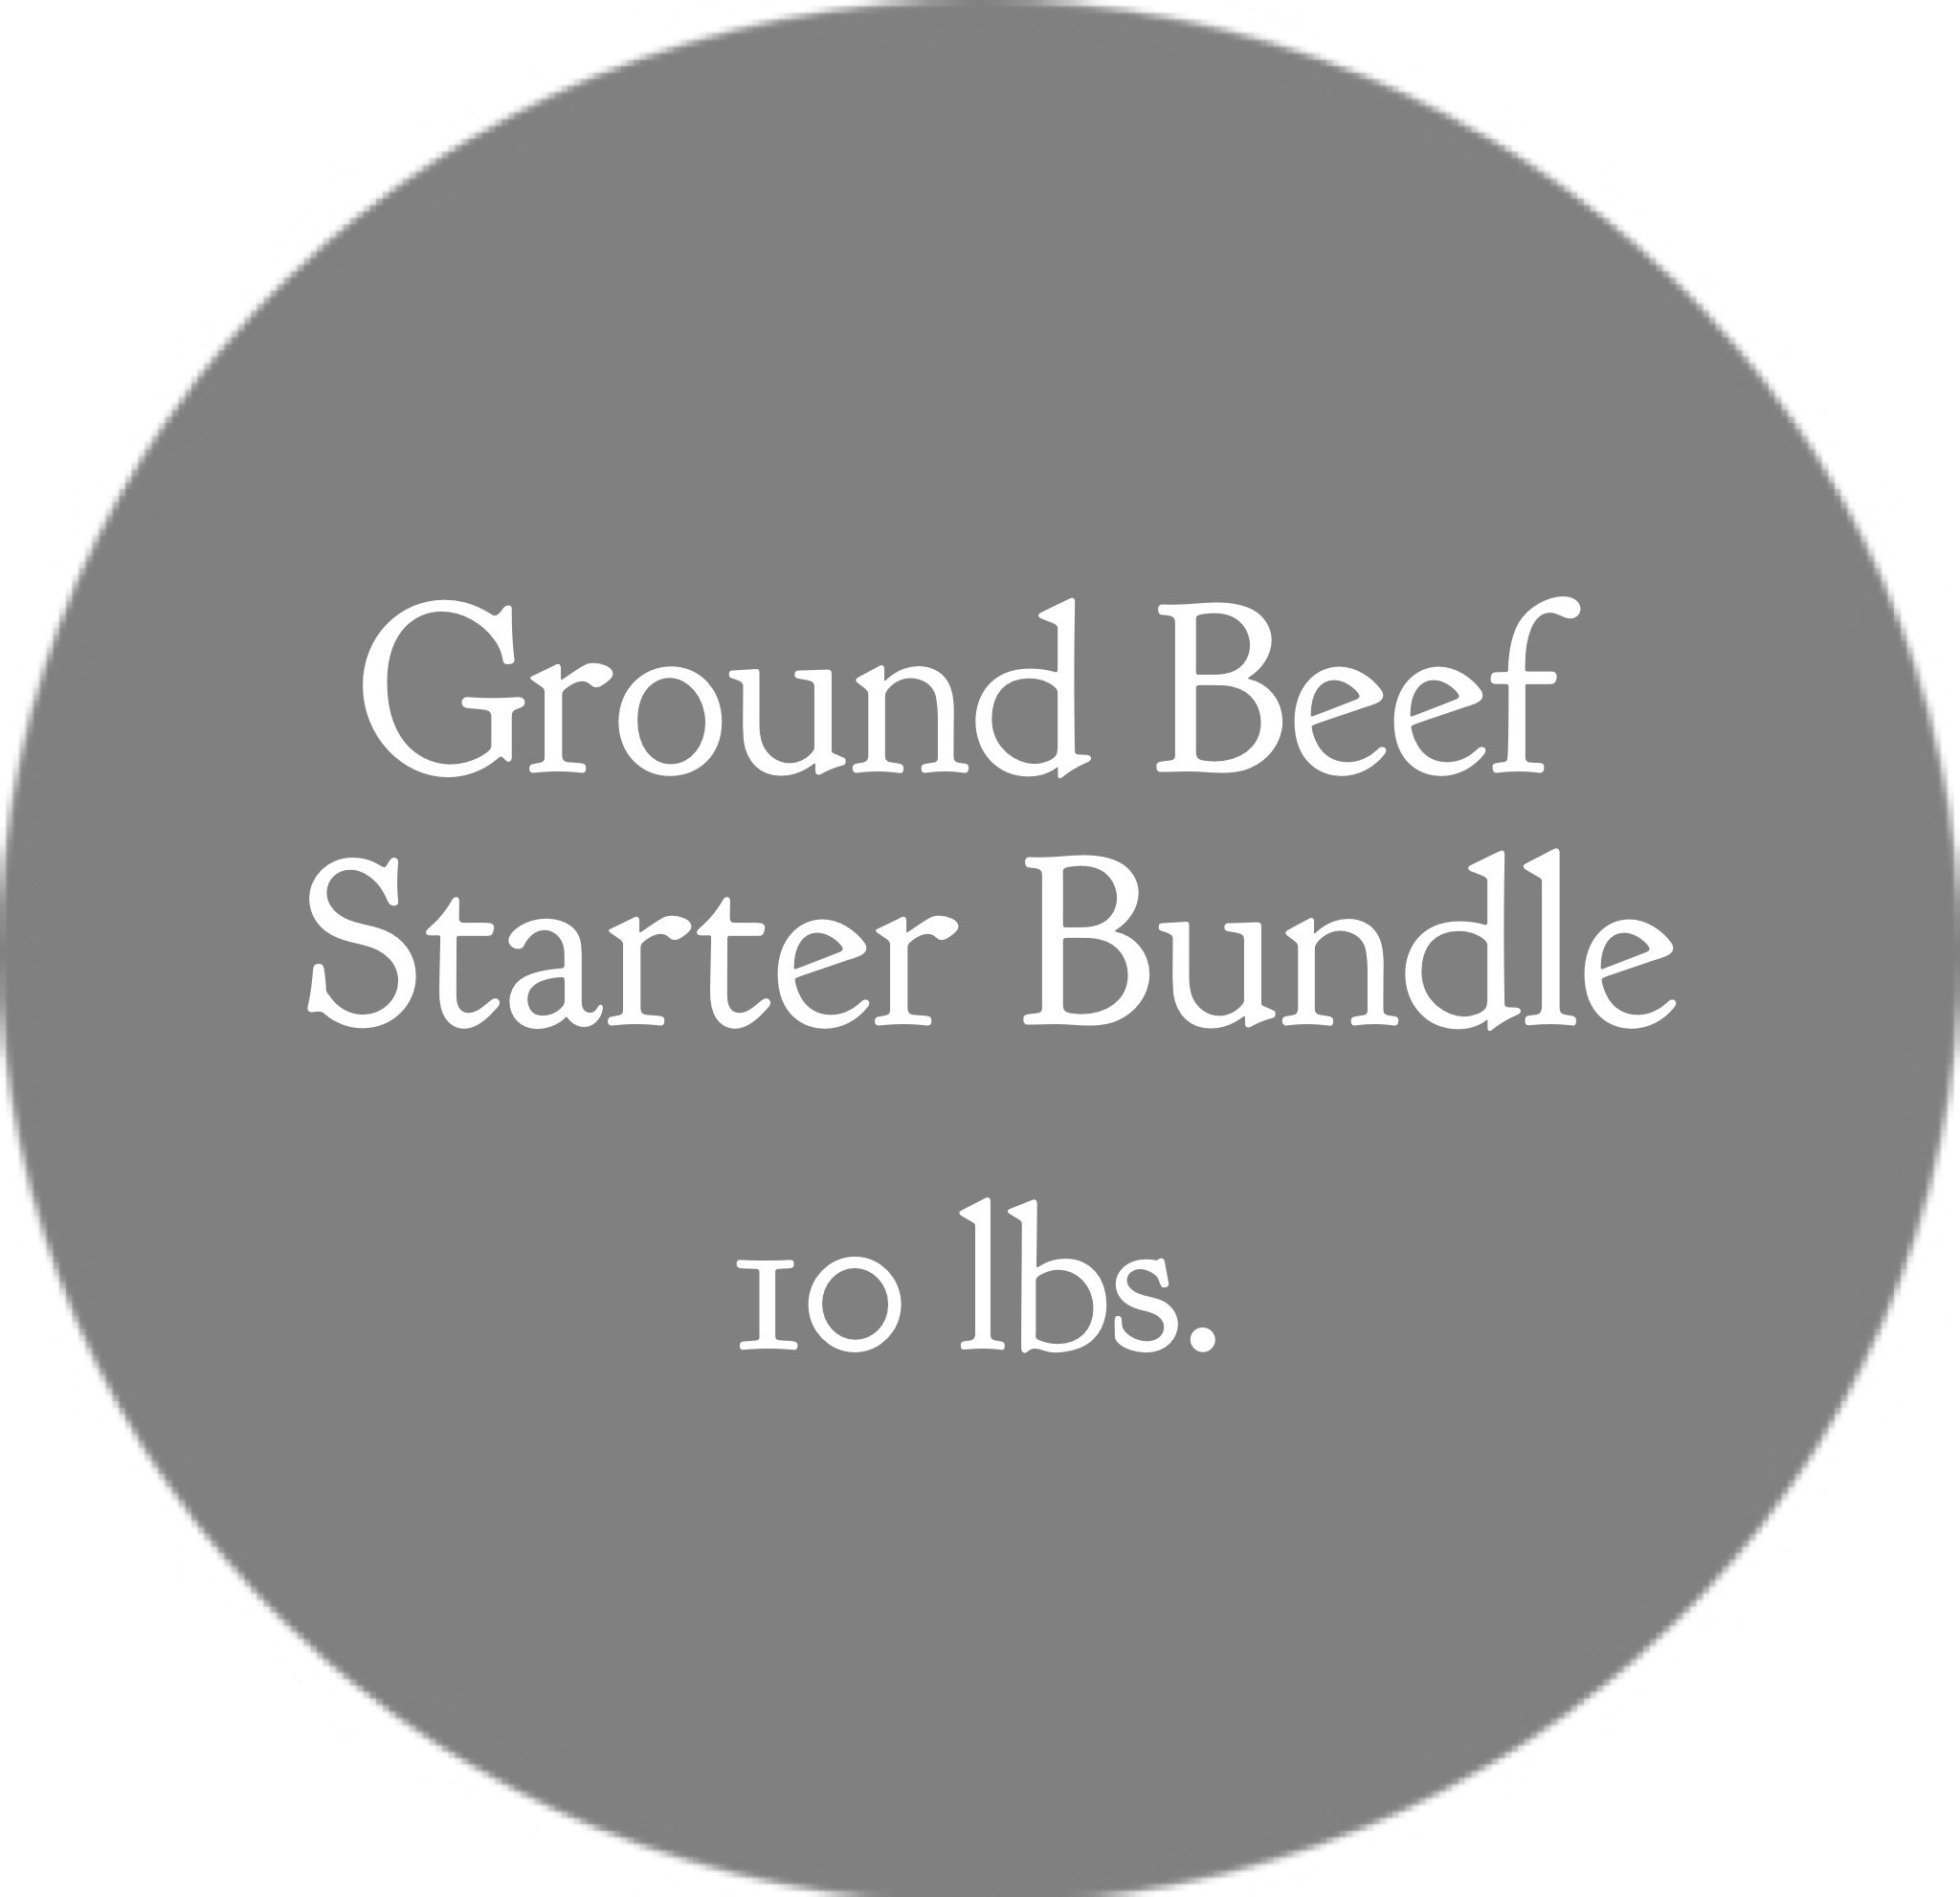 Ground Beef Starter Bundle- 10 lbs